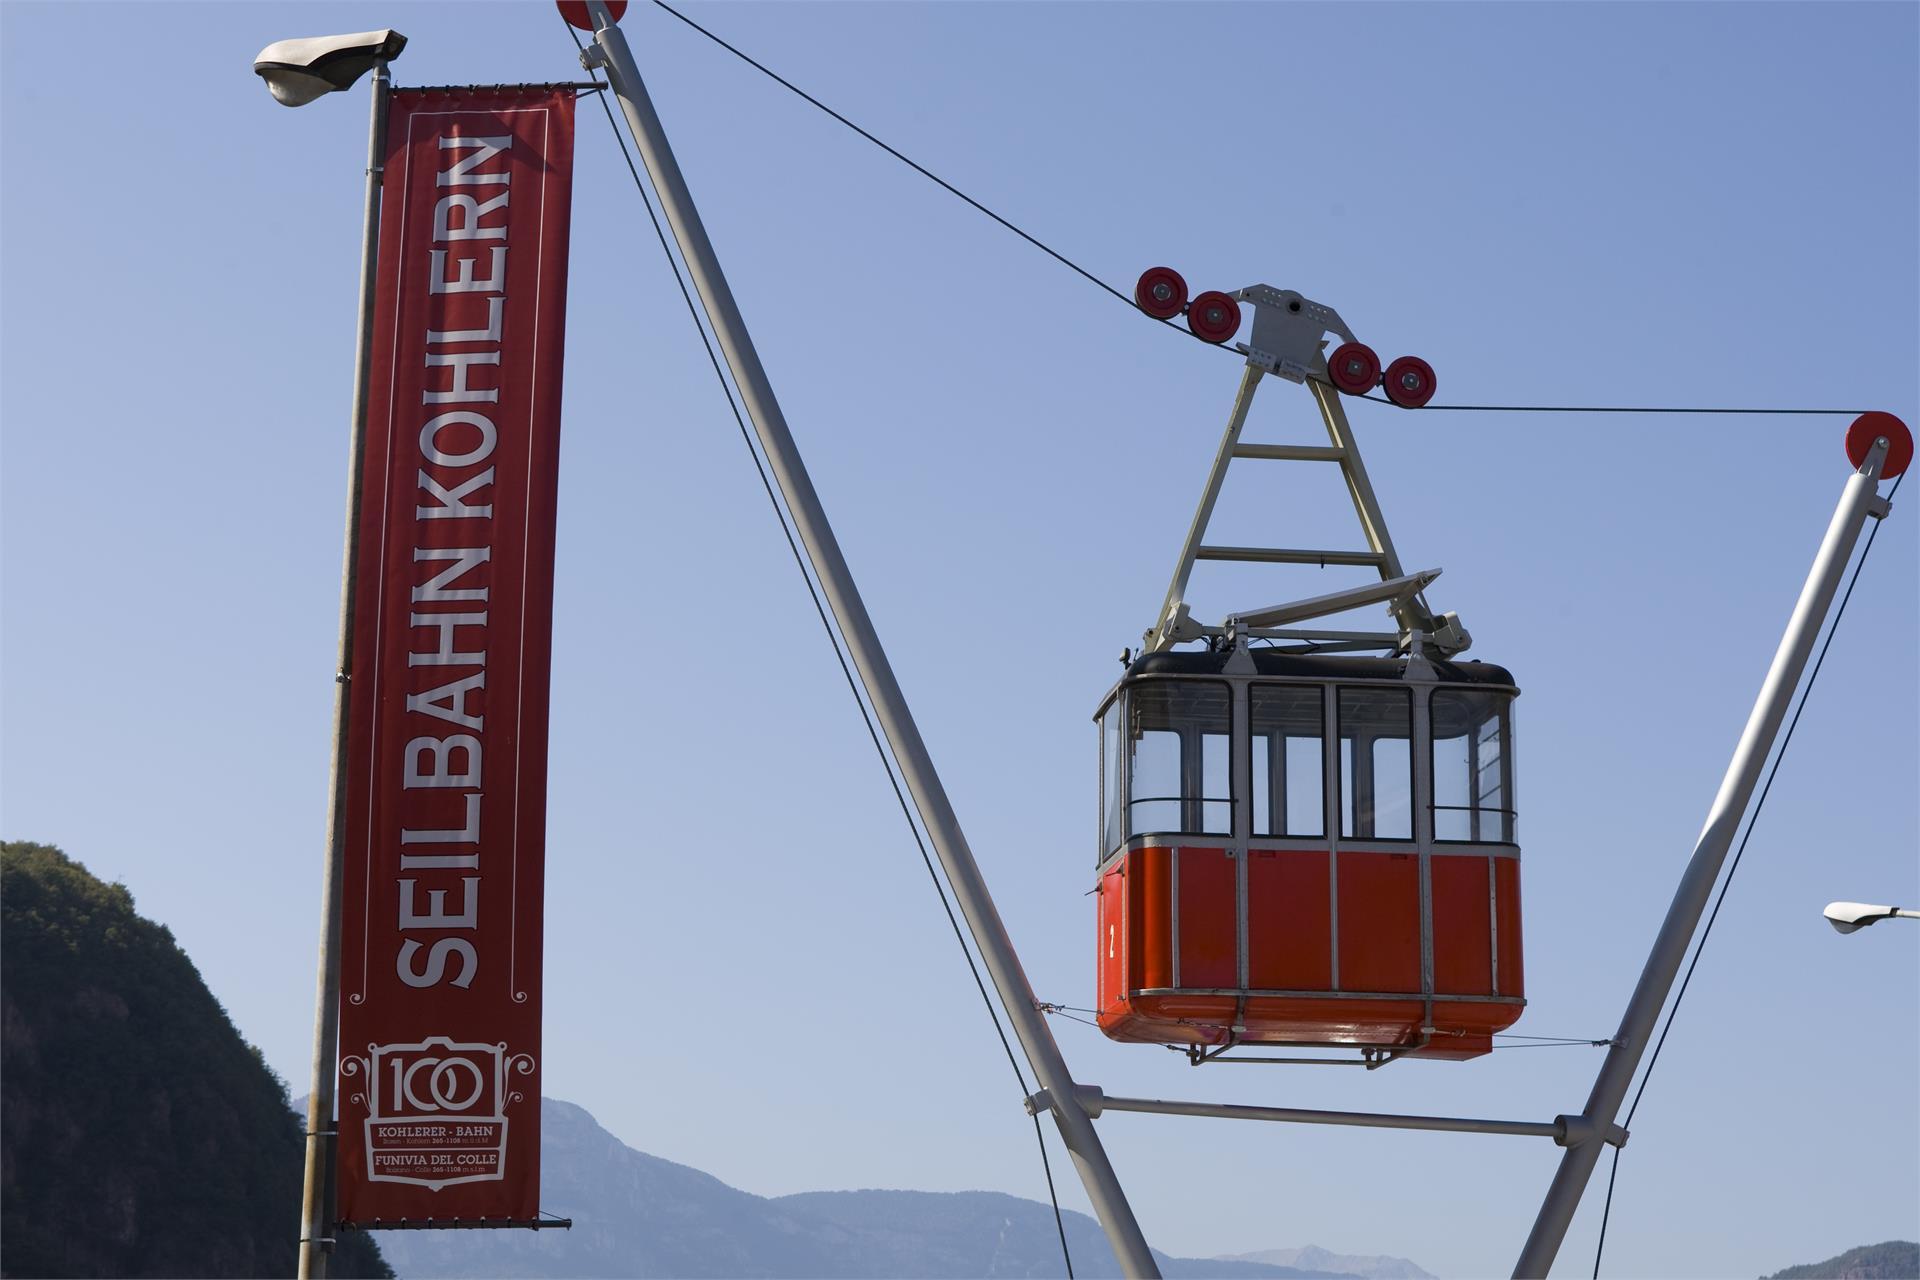 Snowshoe tour Nova Ponente - Colle - Bolzano